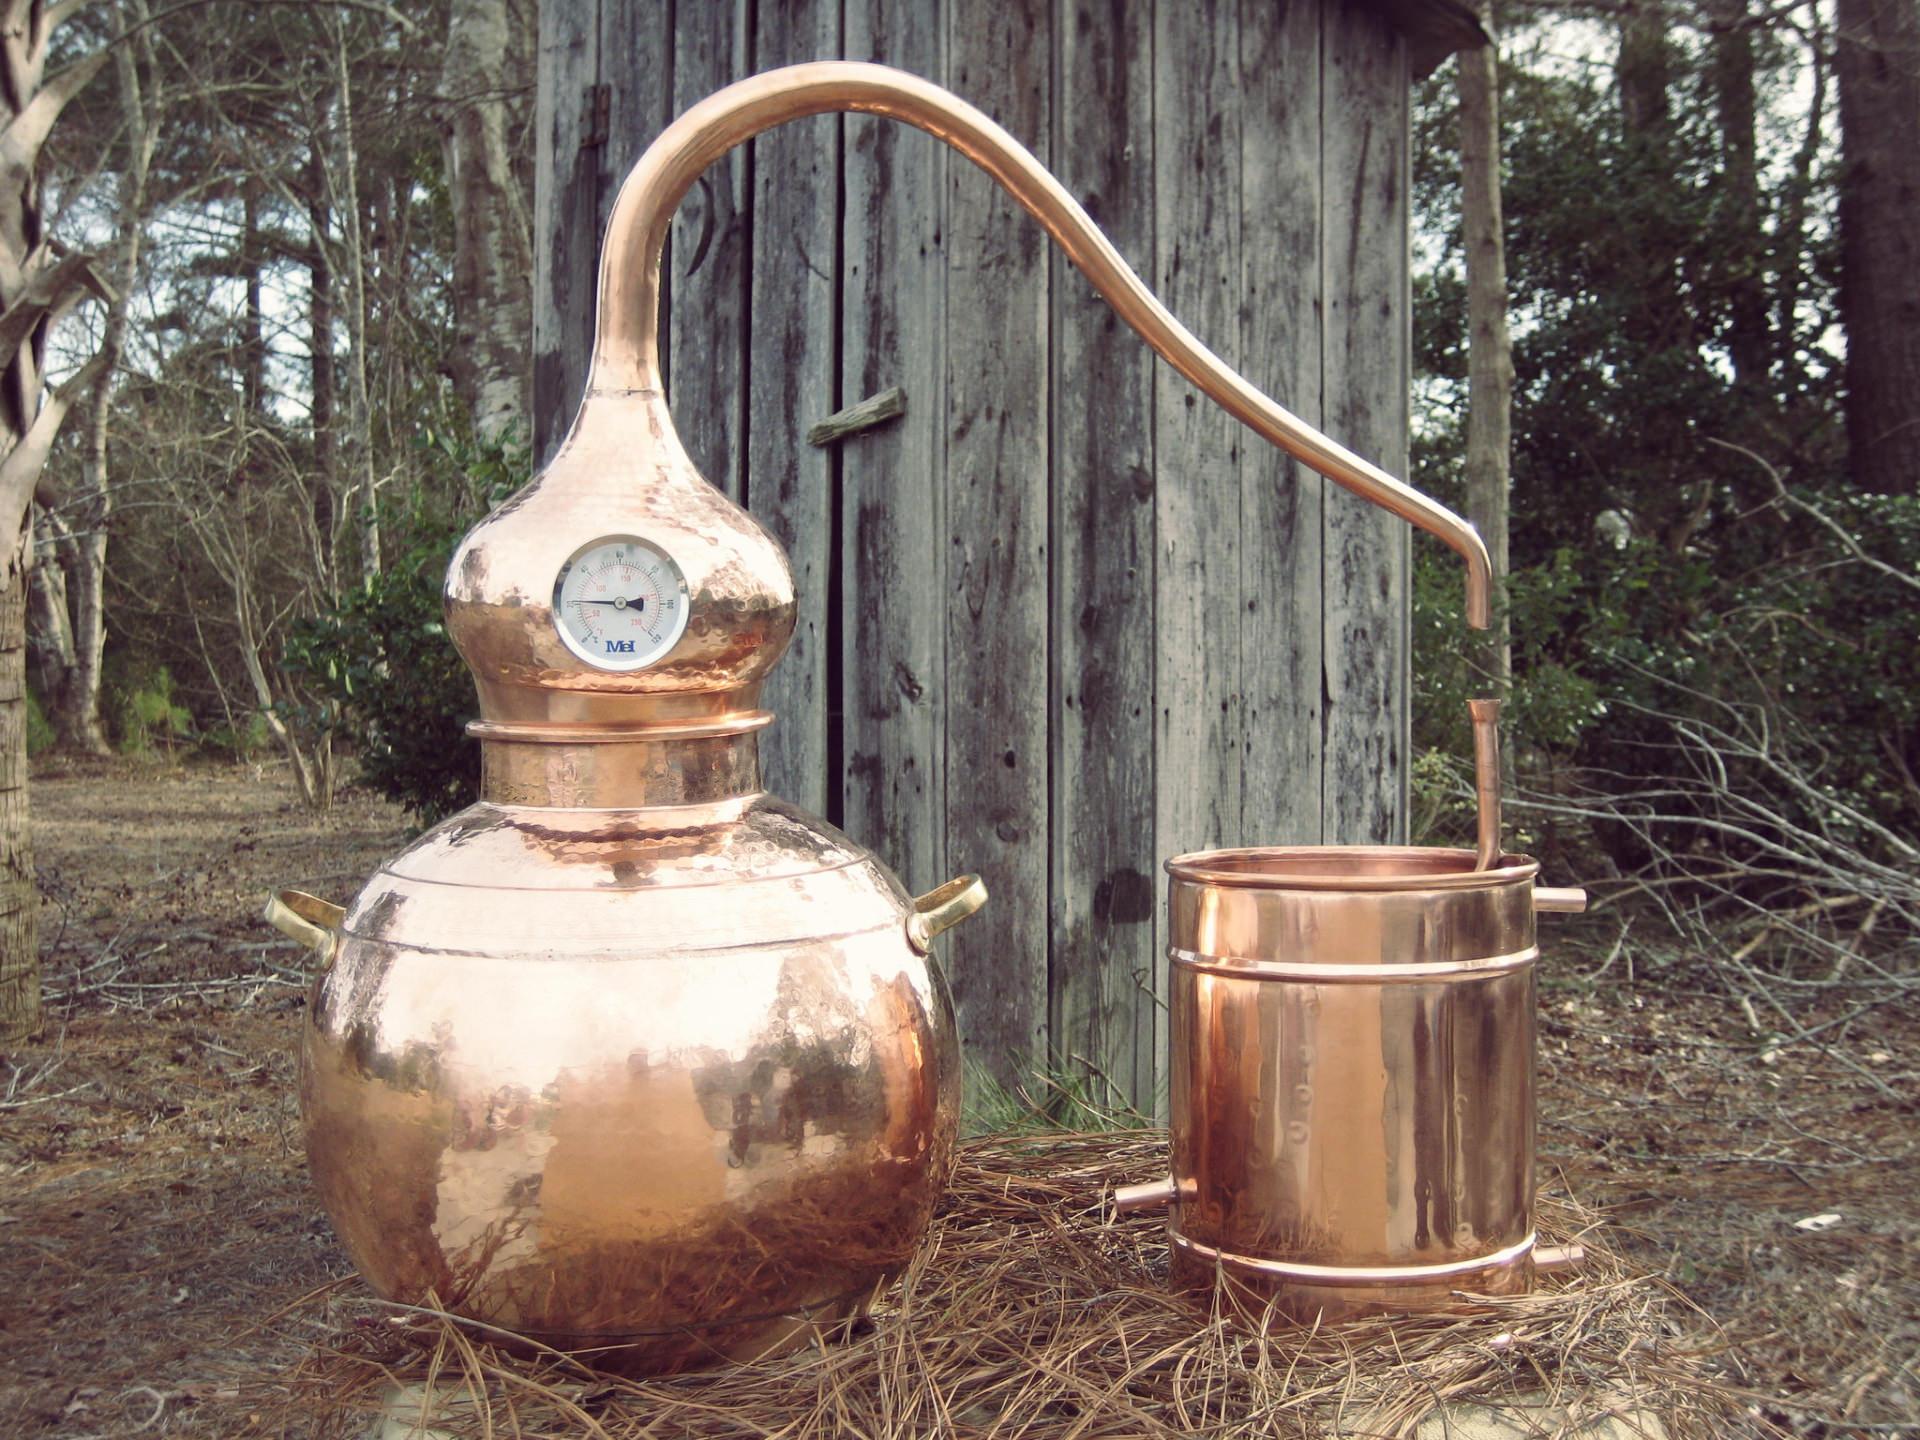 Home distilled spirits plant.